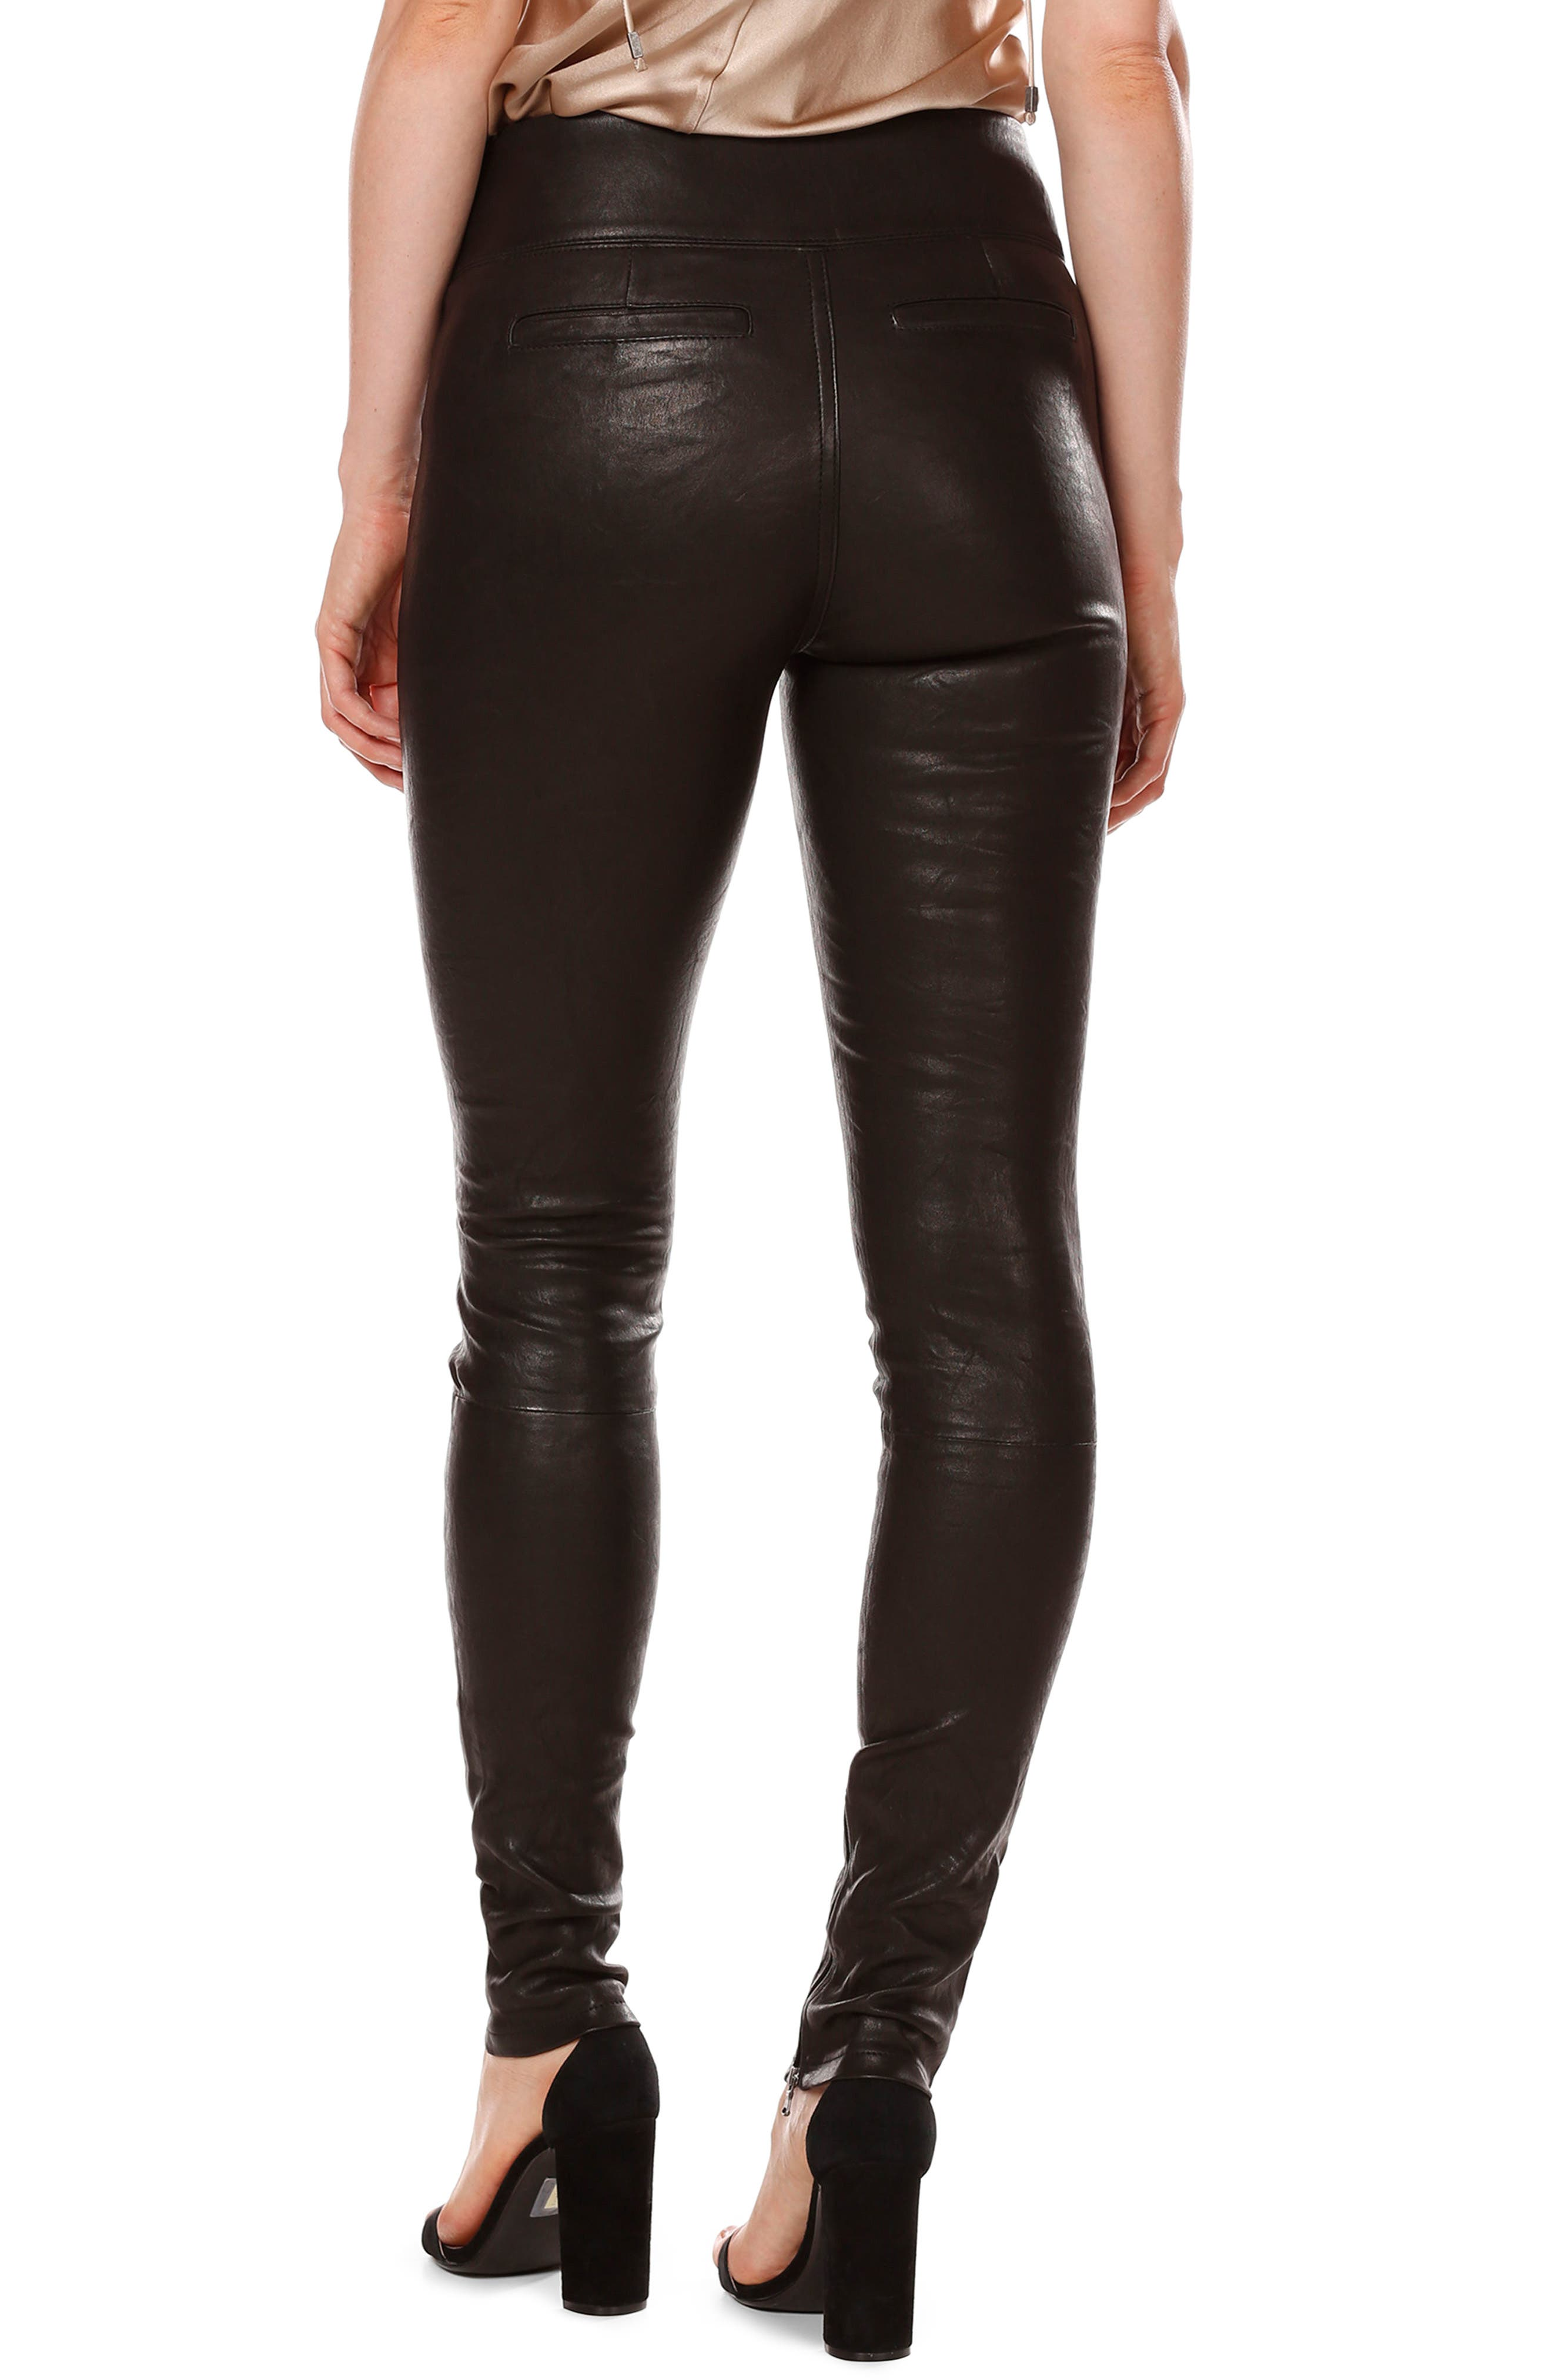 Rosie HW x PAIGE Ellery Ankle Zip Leather Pants,                             Alternate thumbnail 2, color,                             001